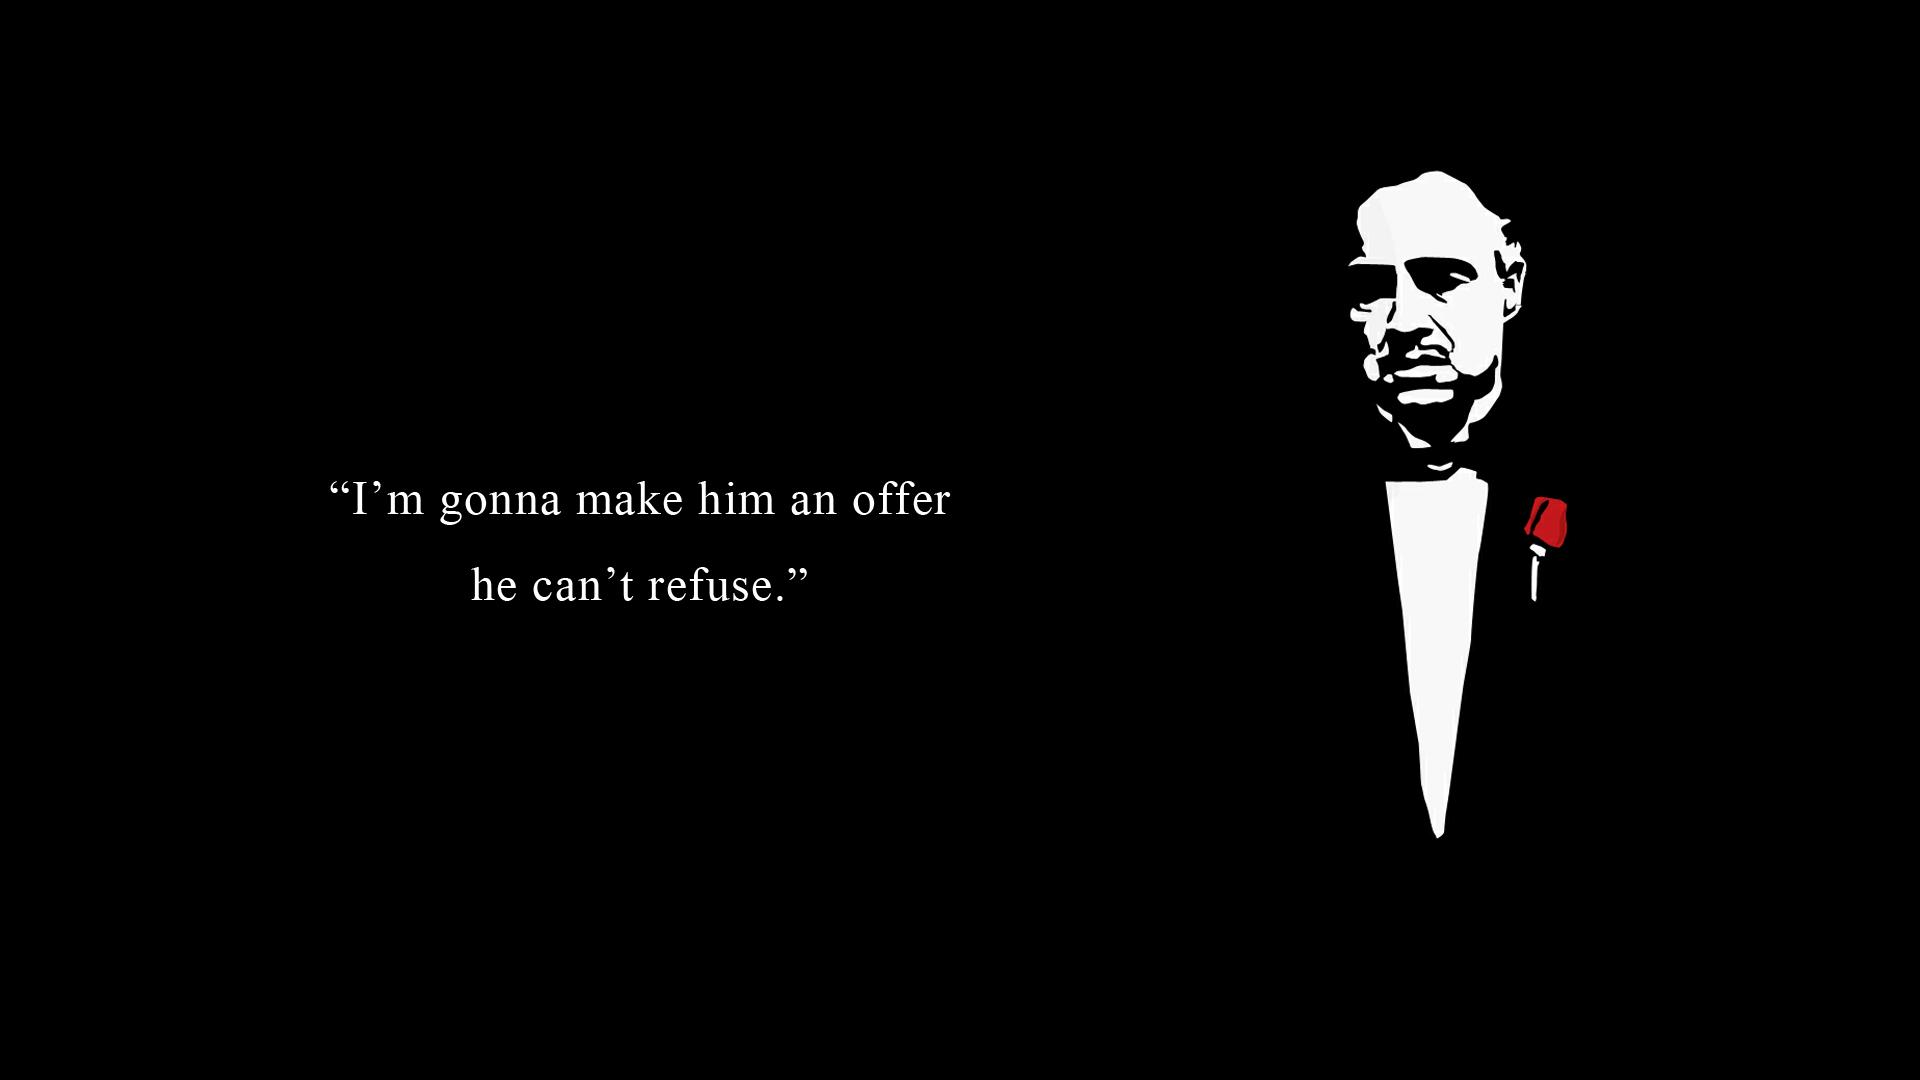 Famous Movie Quotes Million Photos Godfather Quotes Famous Movie Quotes Movie Quotes